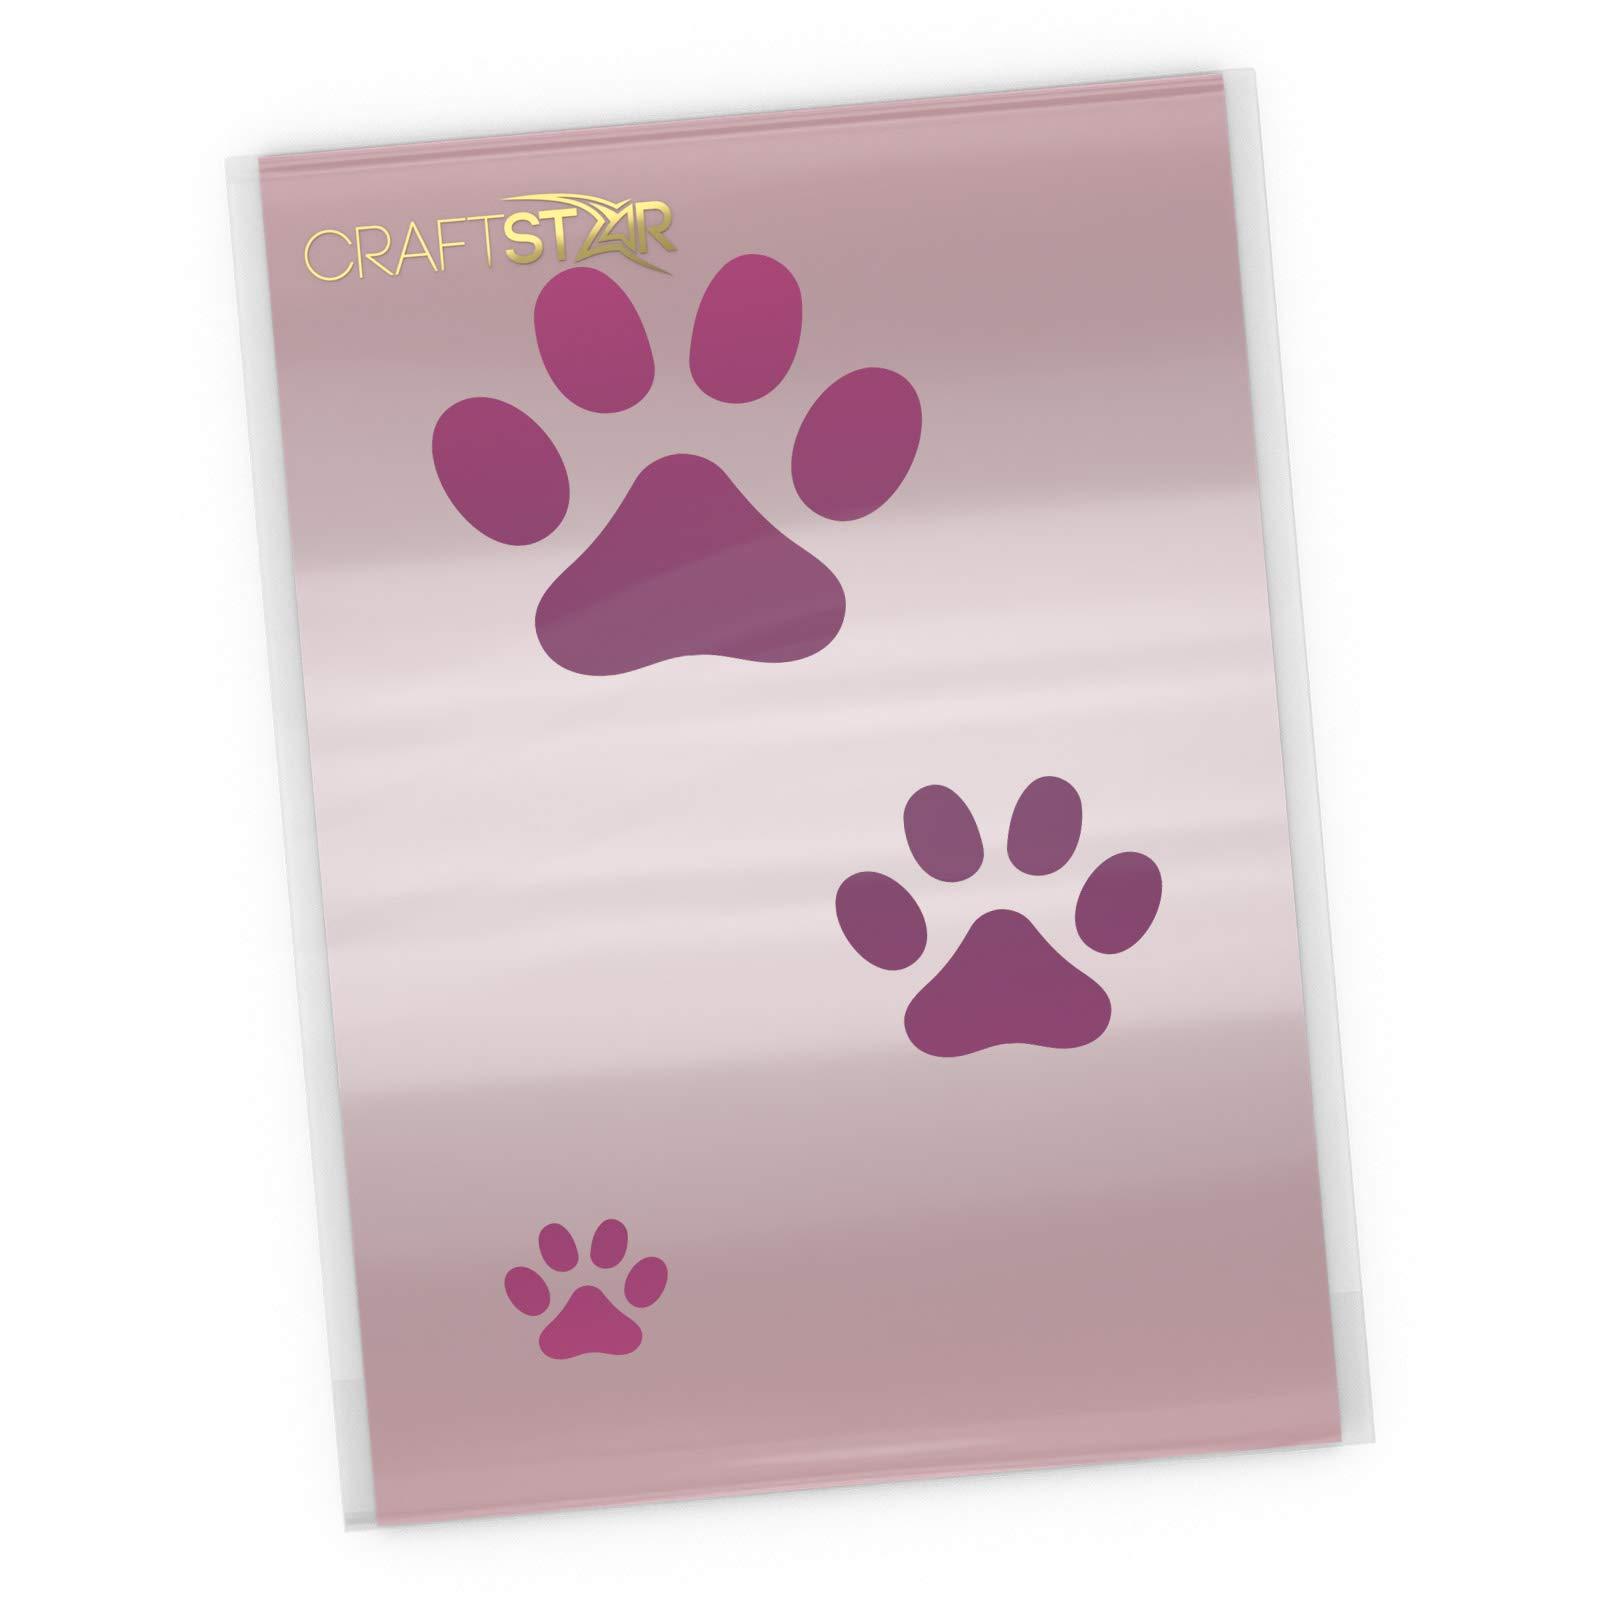 CraftStar Dog Paw Print Stencil - Set of 3 Sizes of Dog Paw Print Stencil Templates